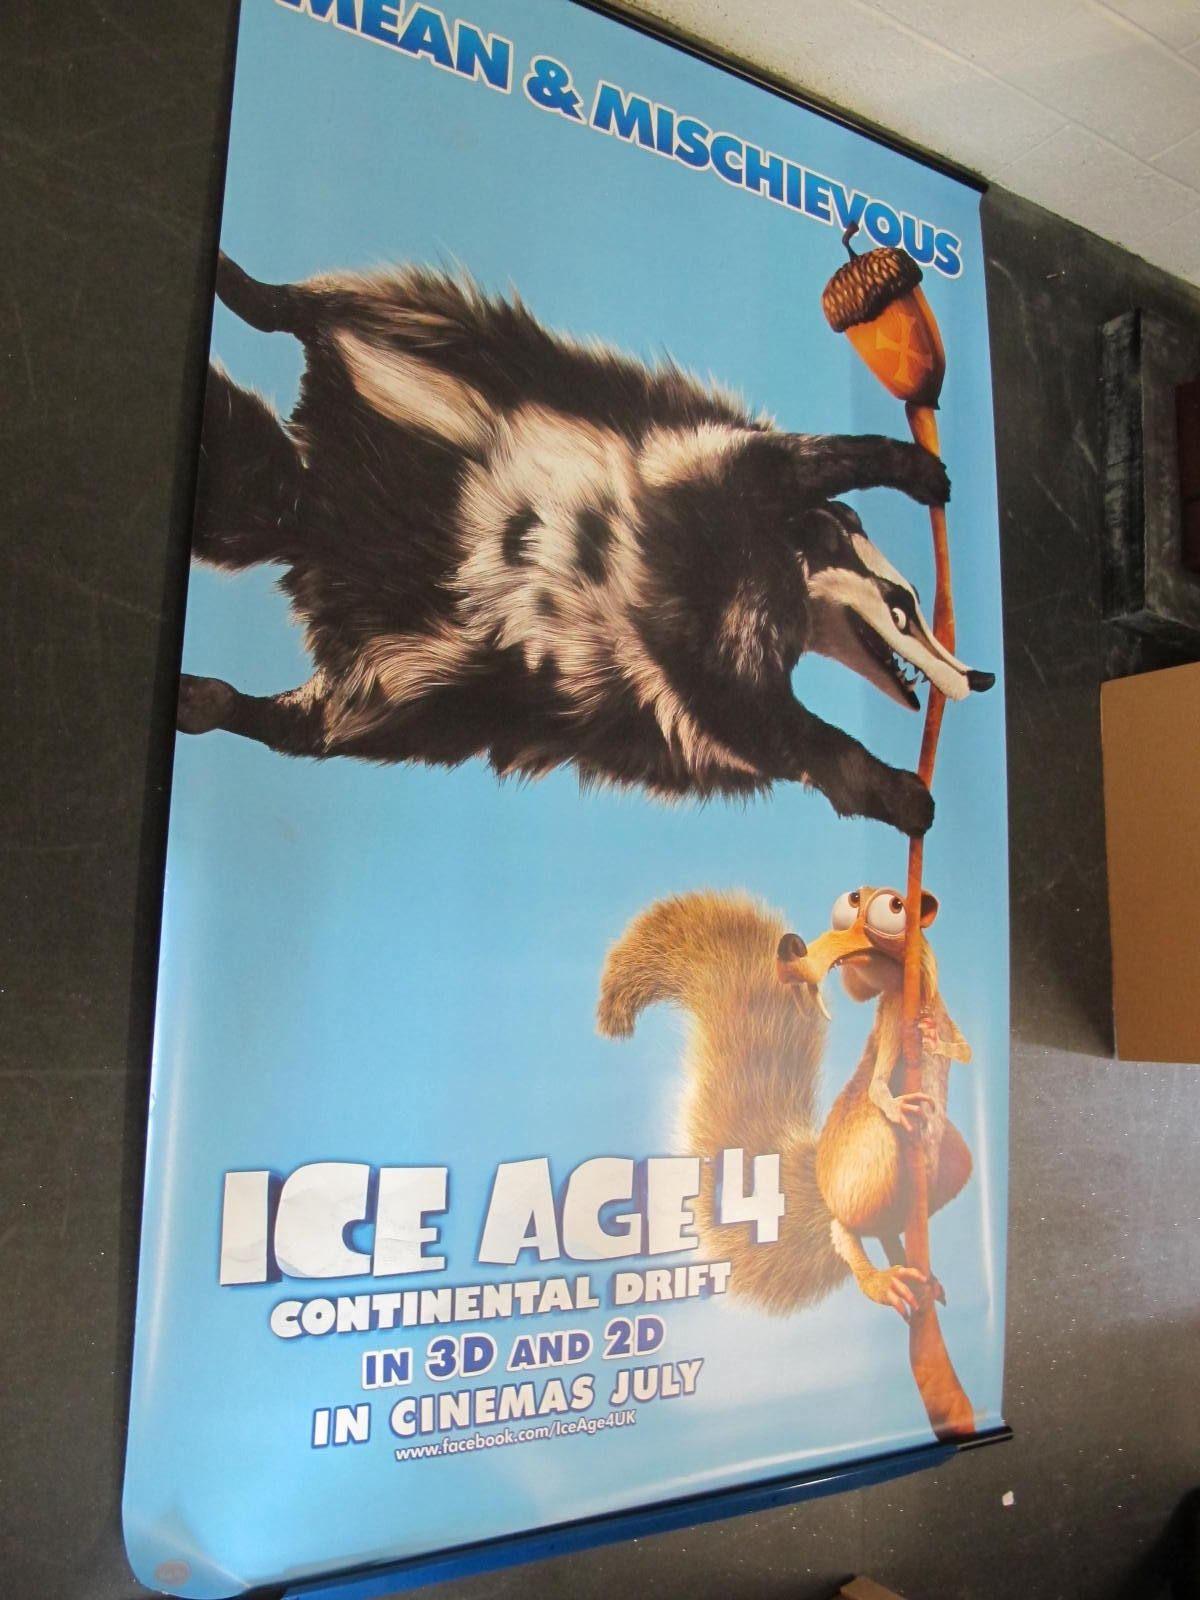 Ice Age 4, 2012 Official Cinema Banner, 244cm x 152cm.